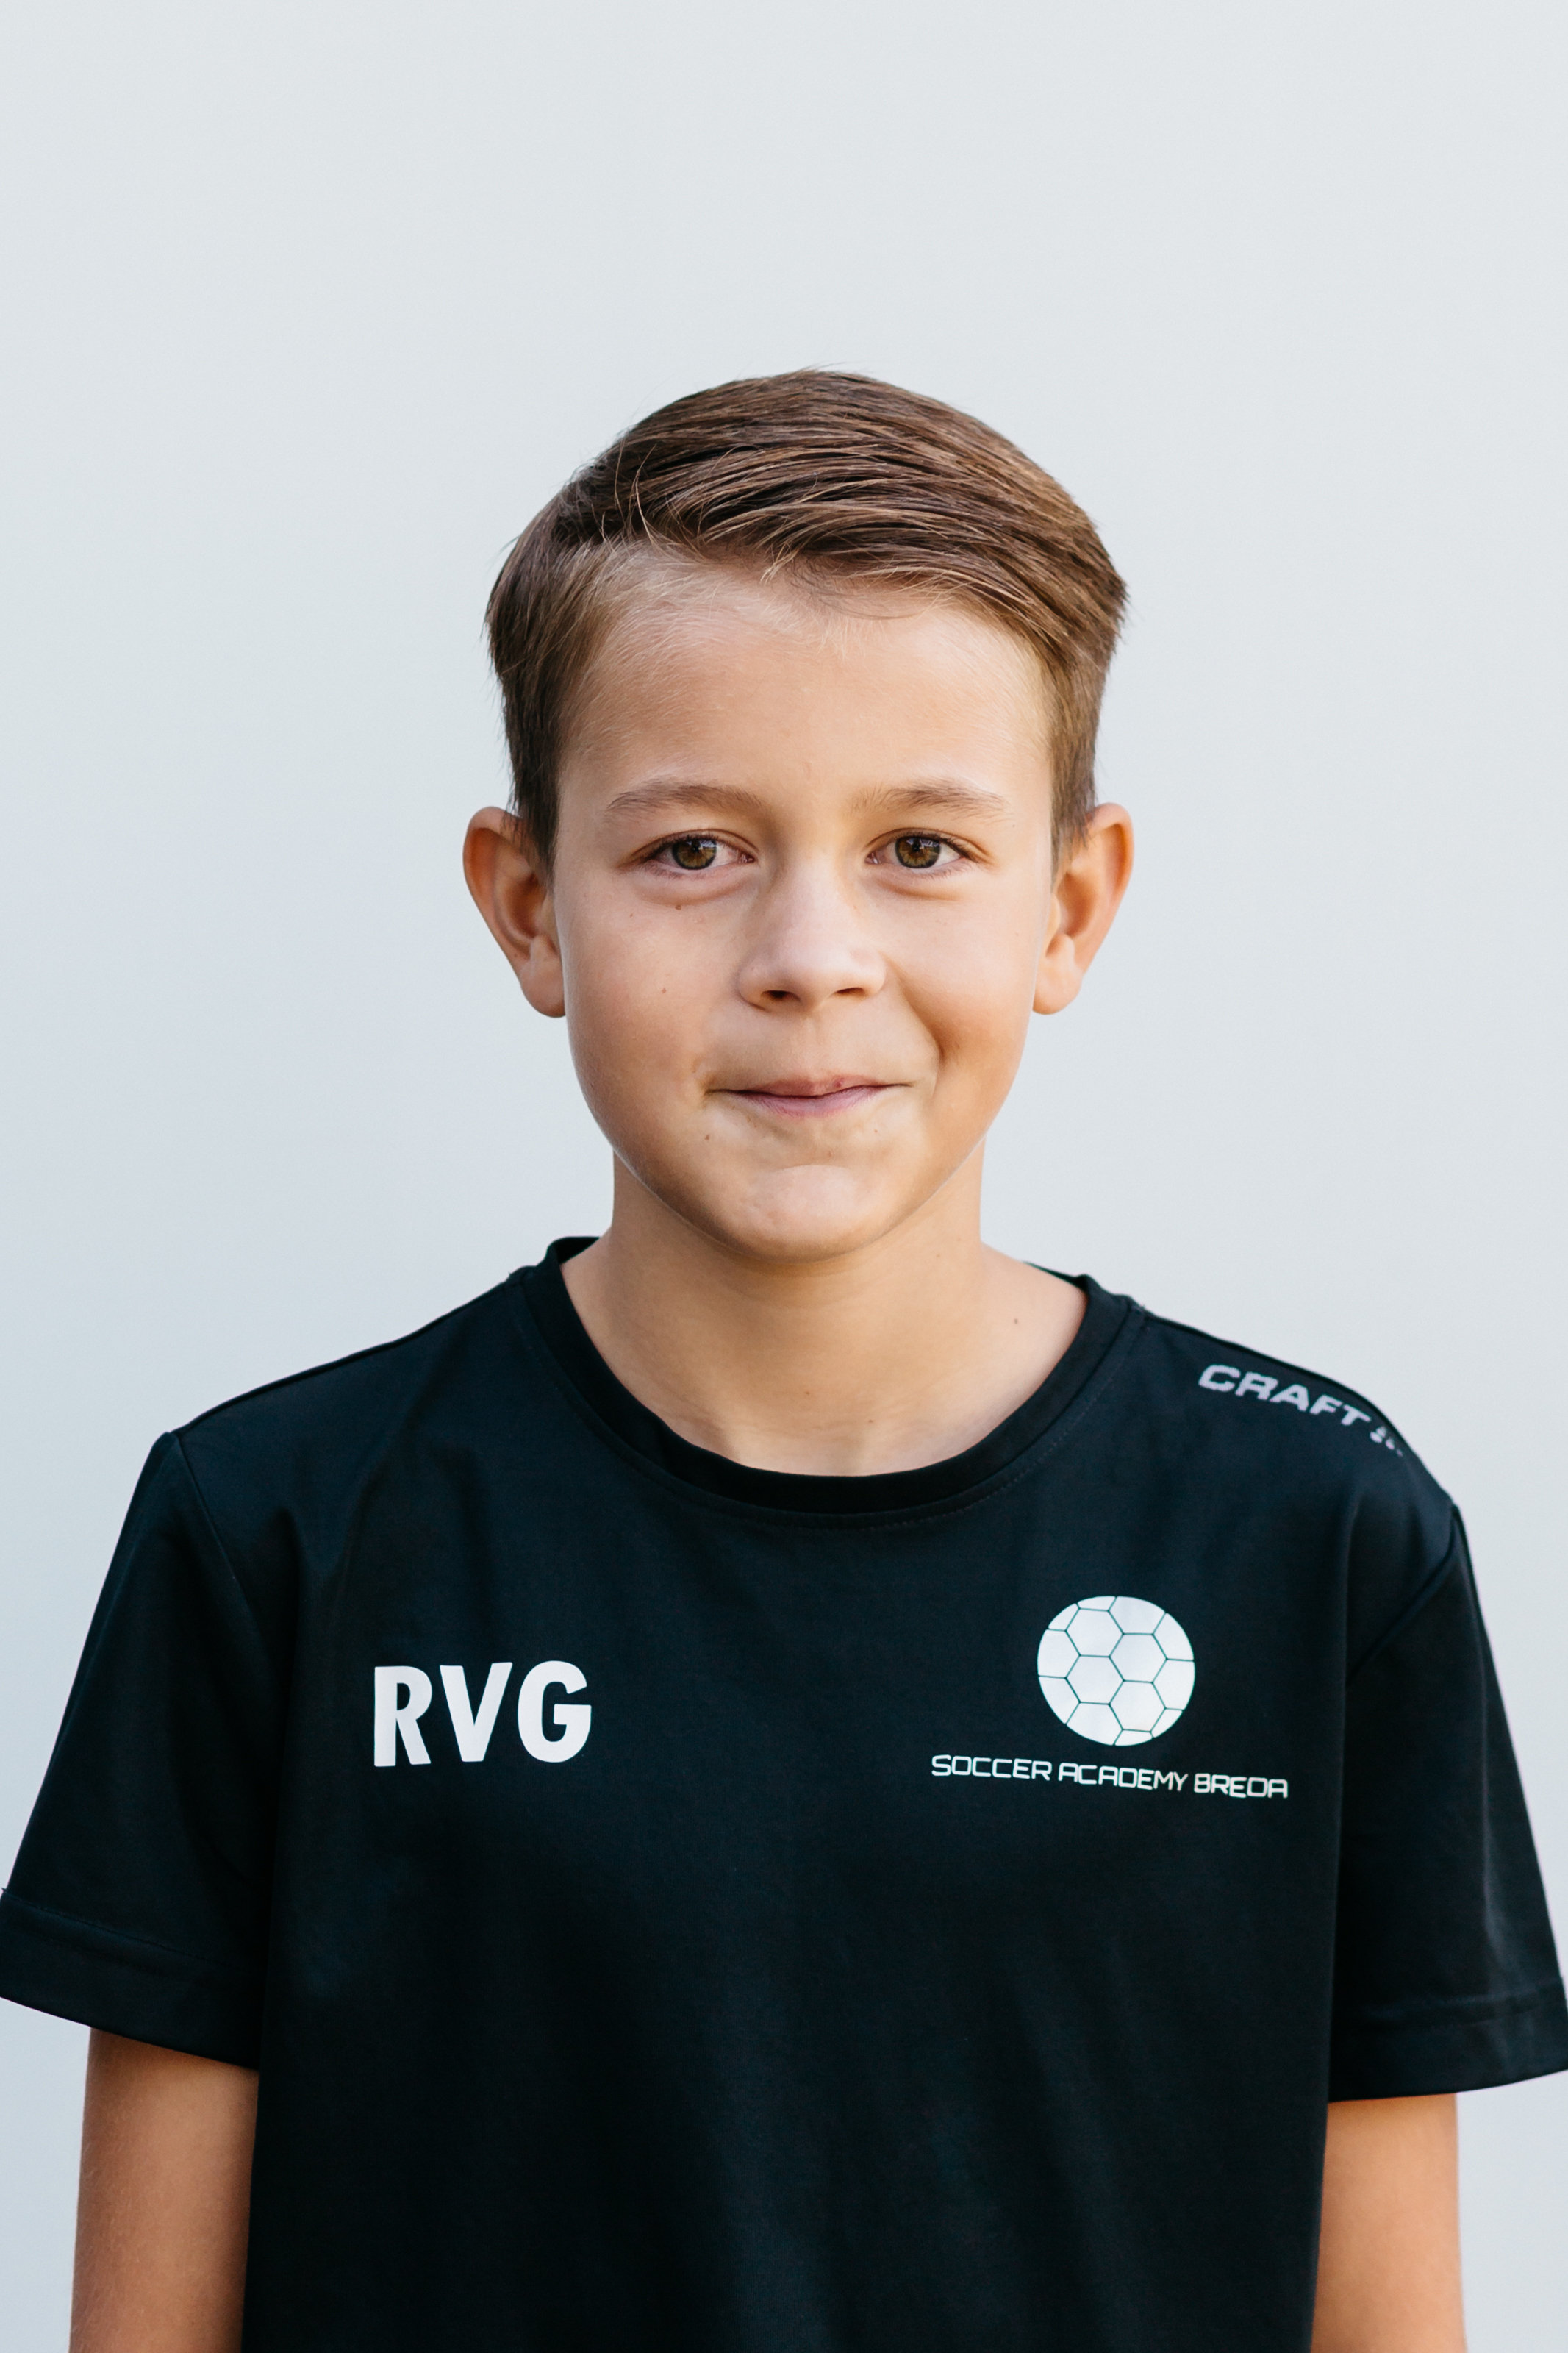 https://socceracademybreda.nl/wp-content/uploads/2020/10/riquelme-van-gool-team.jpg